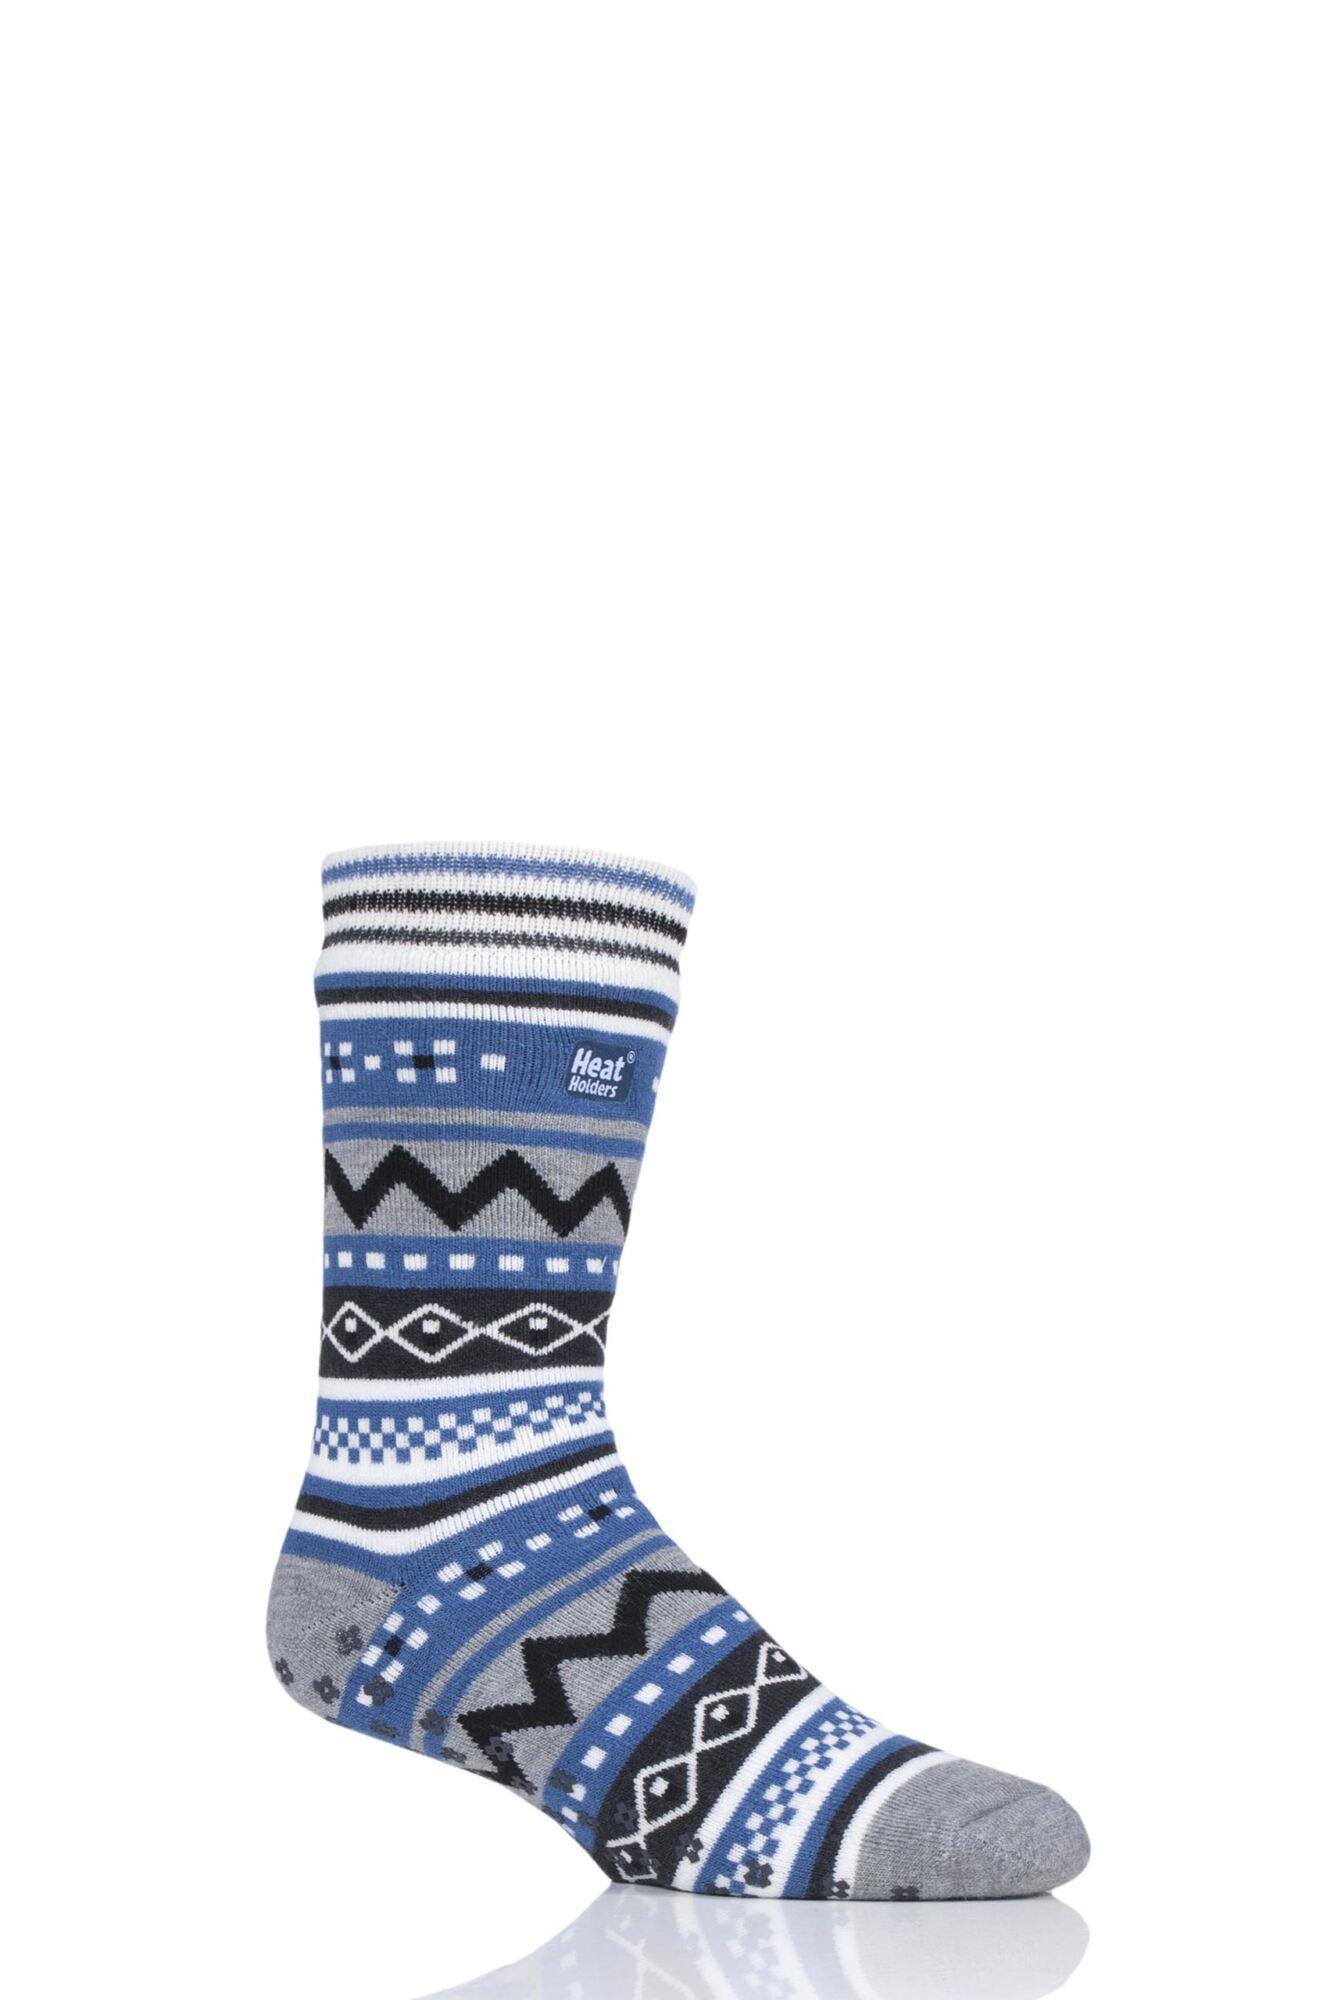 1 Pair Soul Warming Socks Men's - Heat Holders